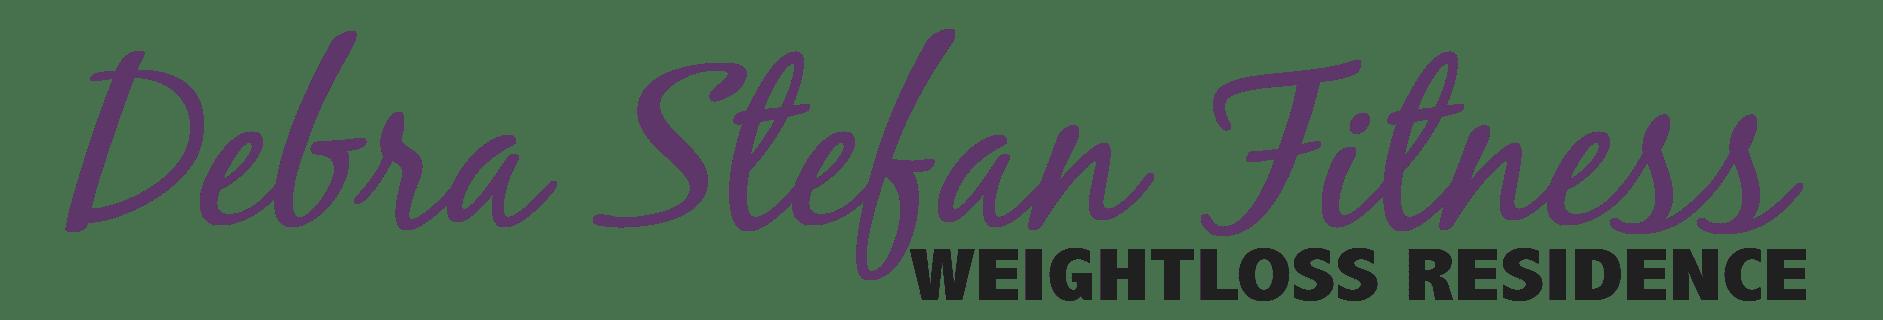 Debra Stefan Fitness Retreat Retina Logo